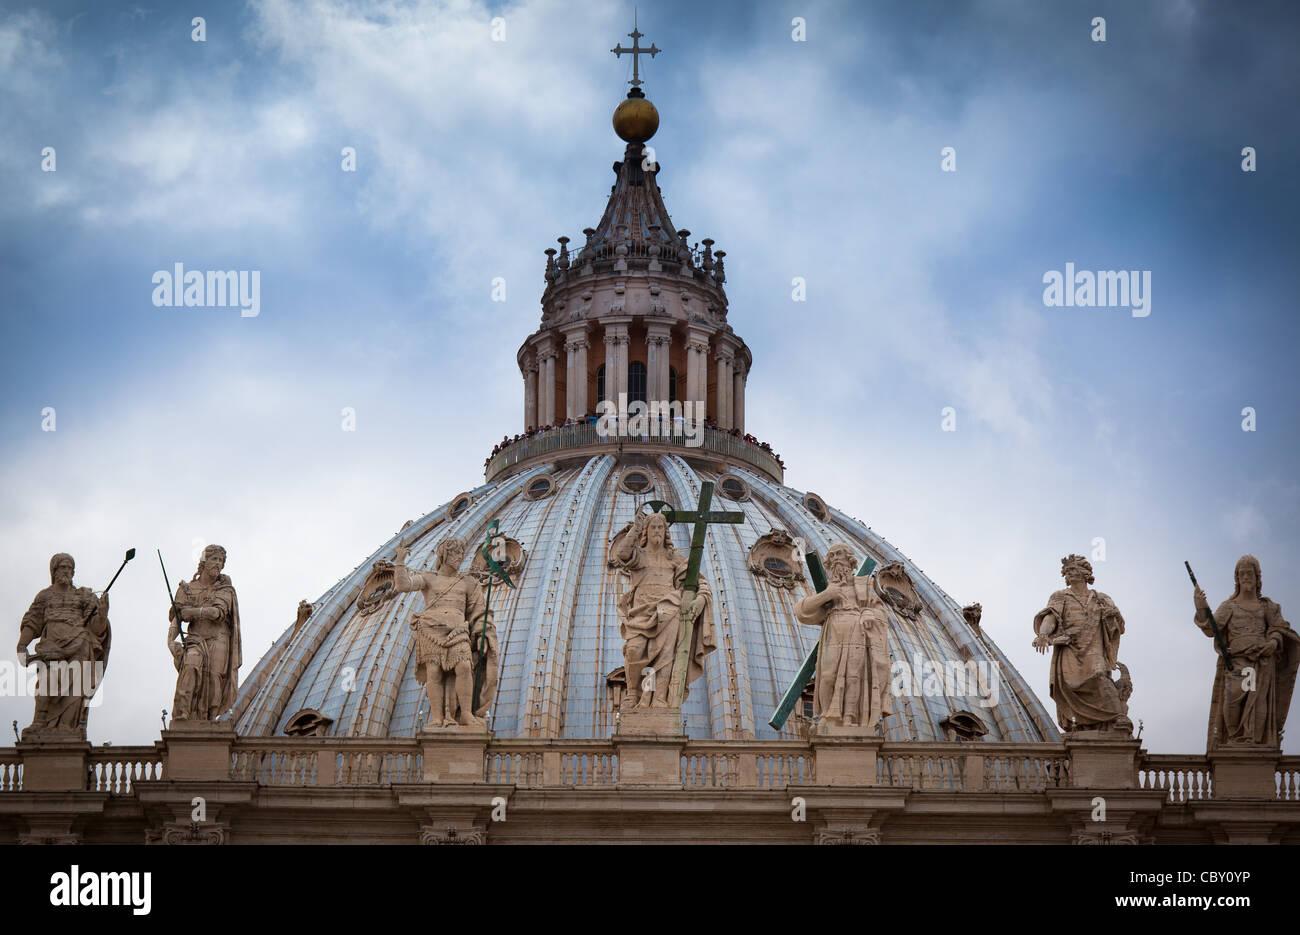 Dach der Petersdom im Vatikan, Rom, Italien Stockbild